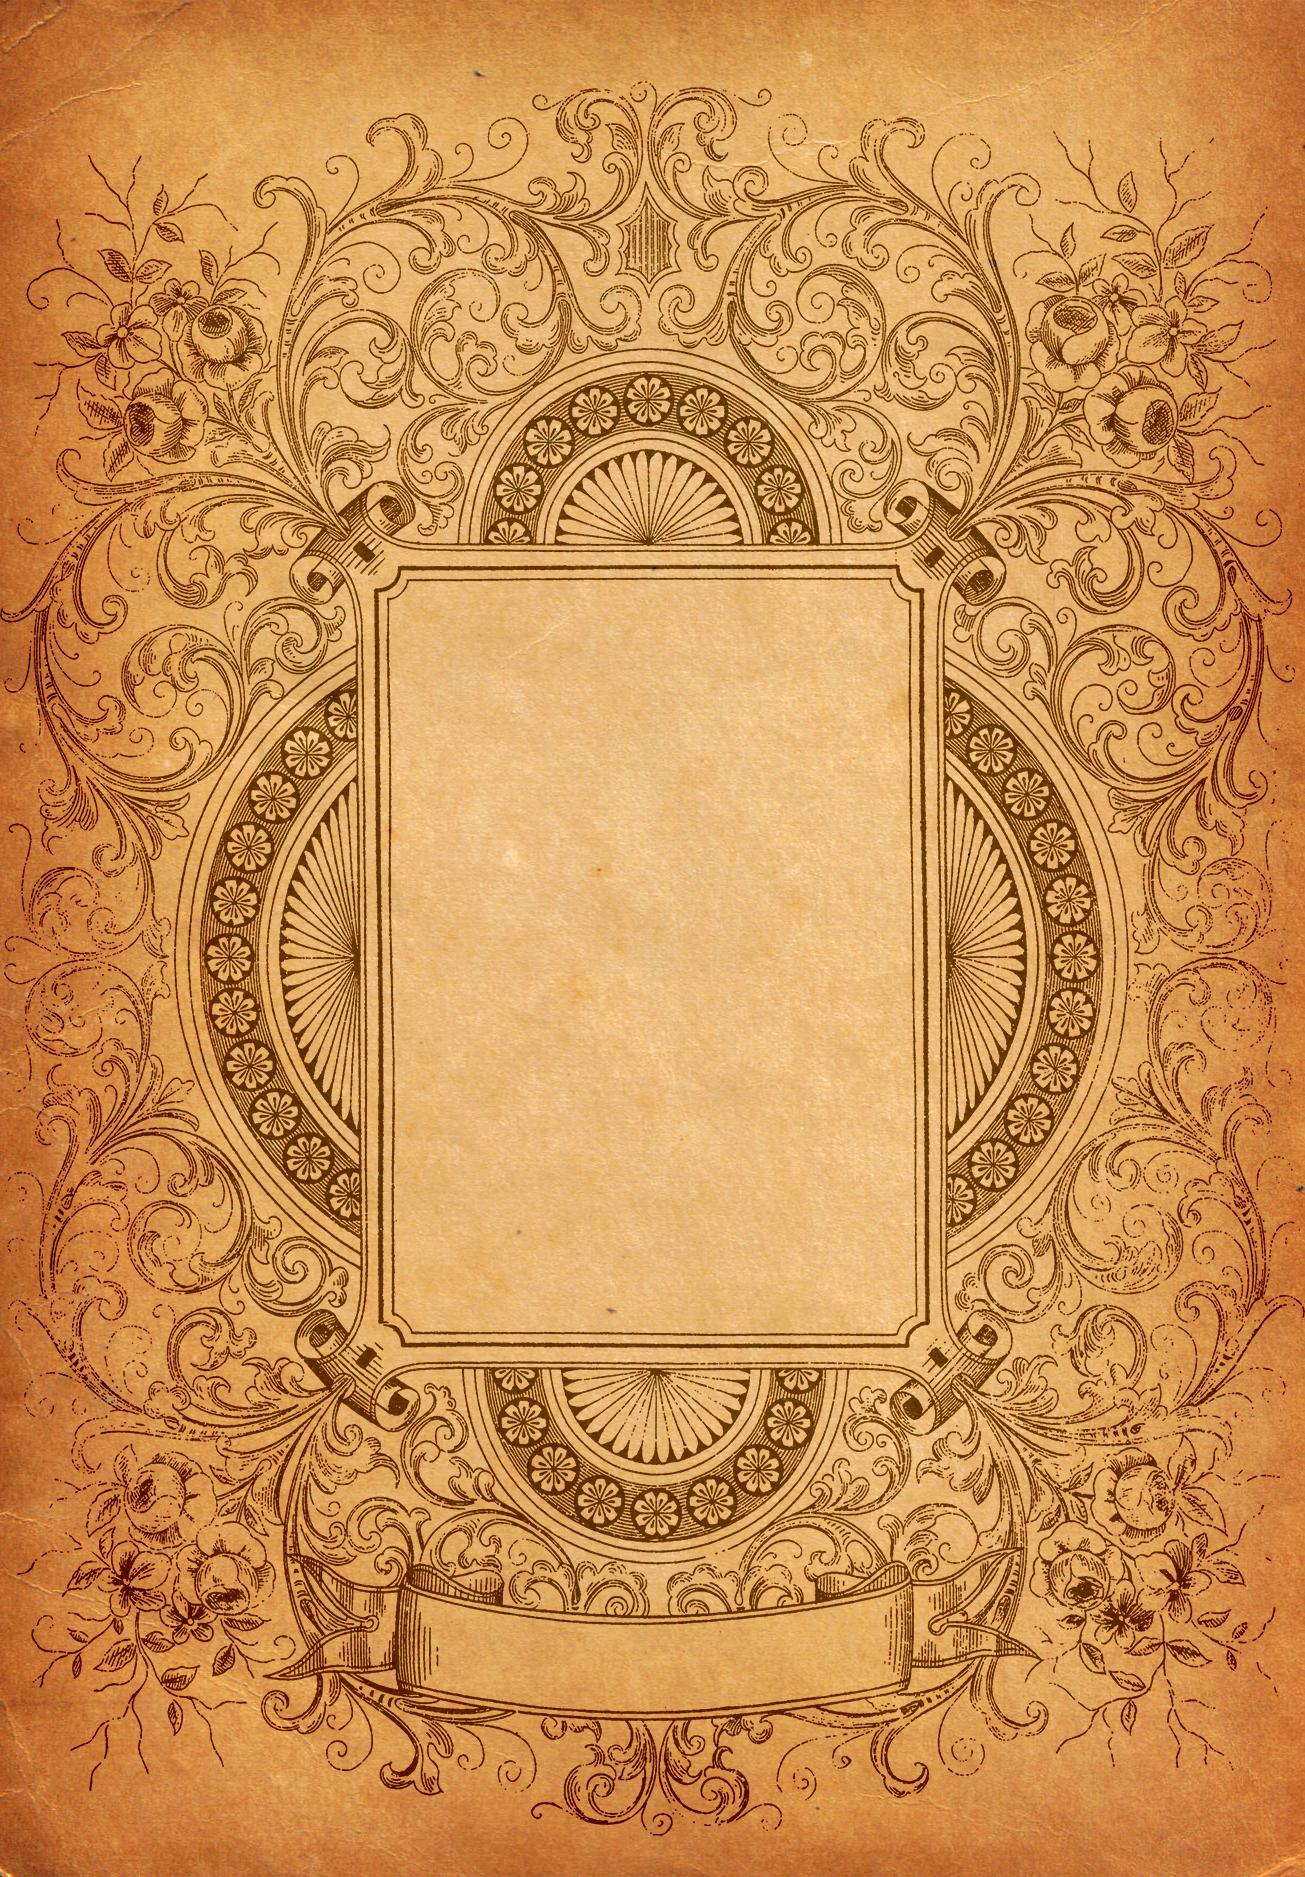 Sheet Music clipart decorative Clip декоративные Art Decorative Винтажные